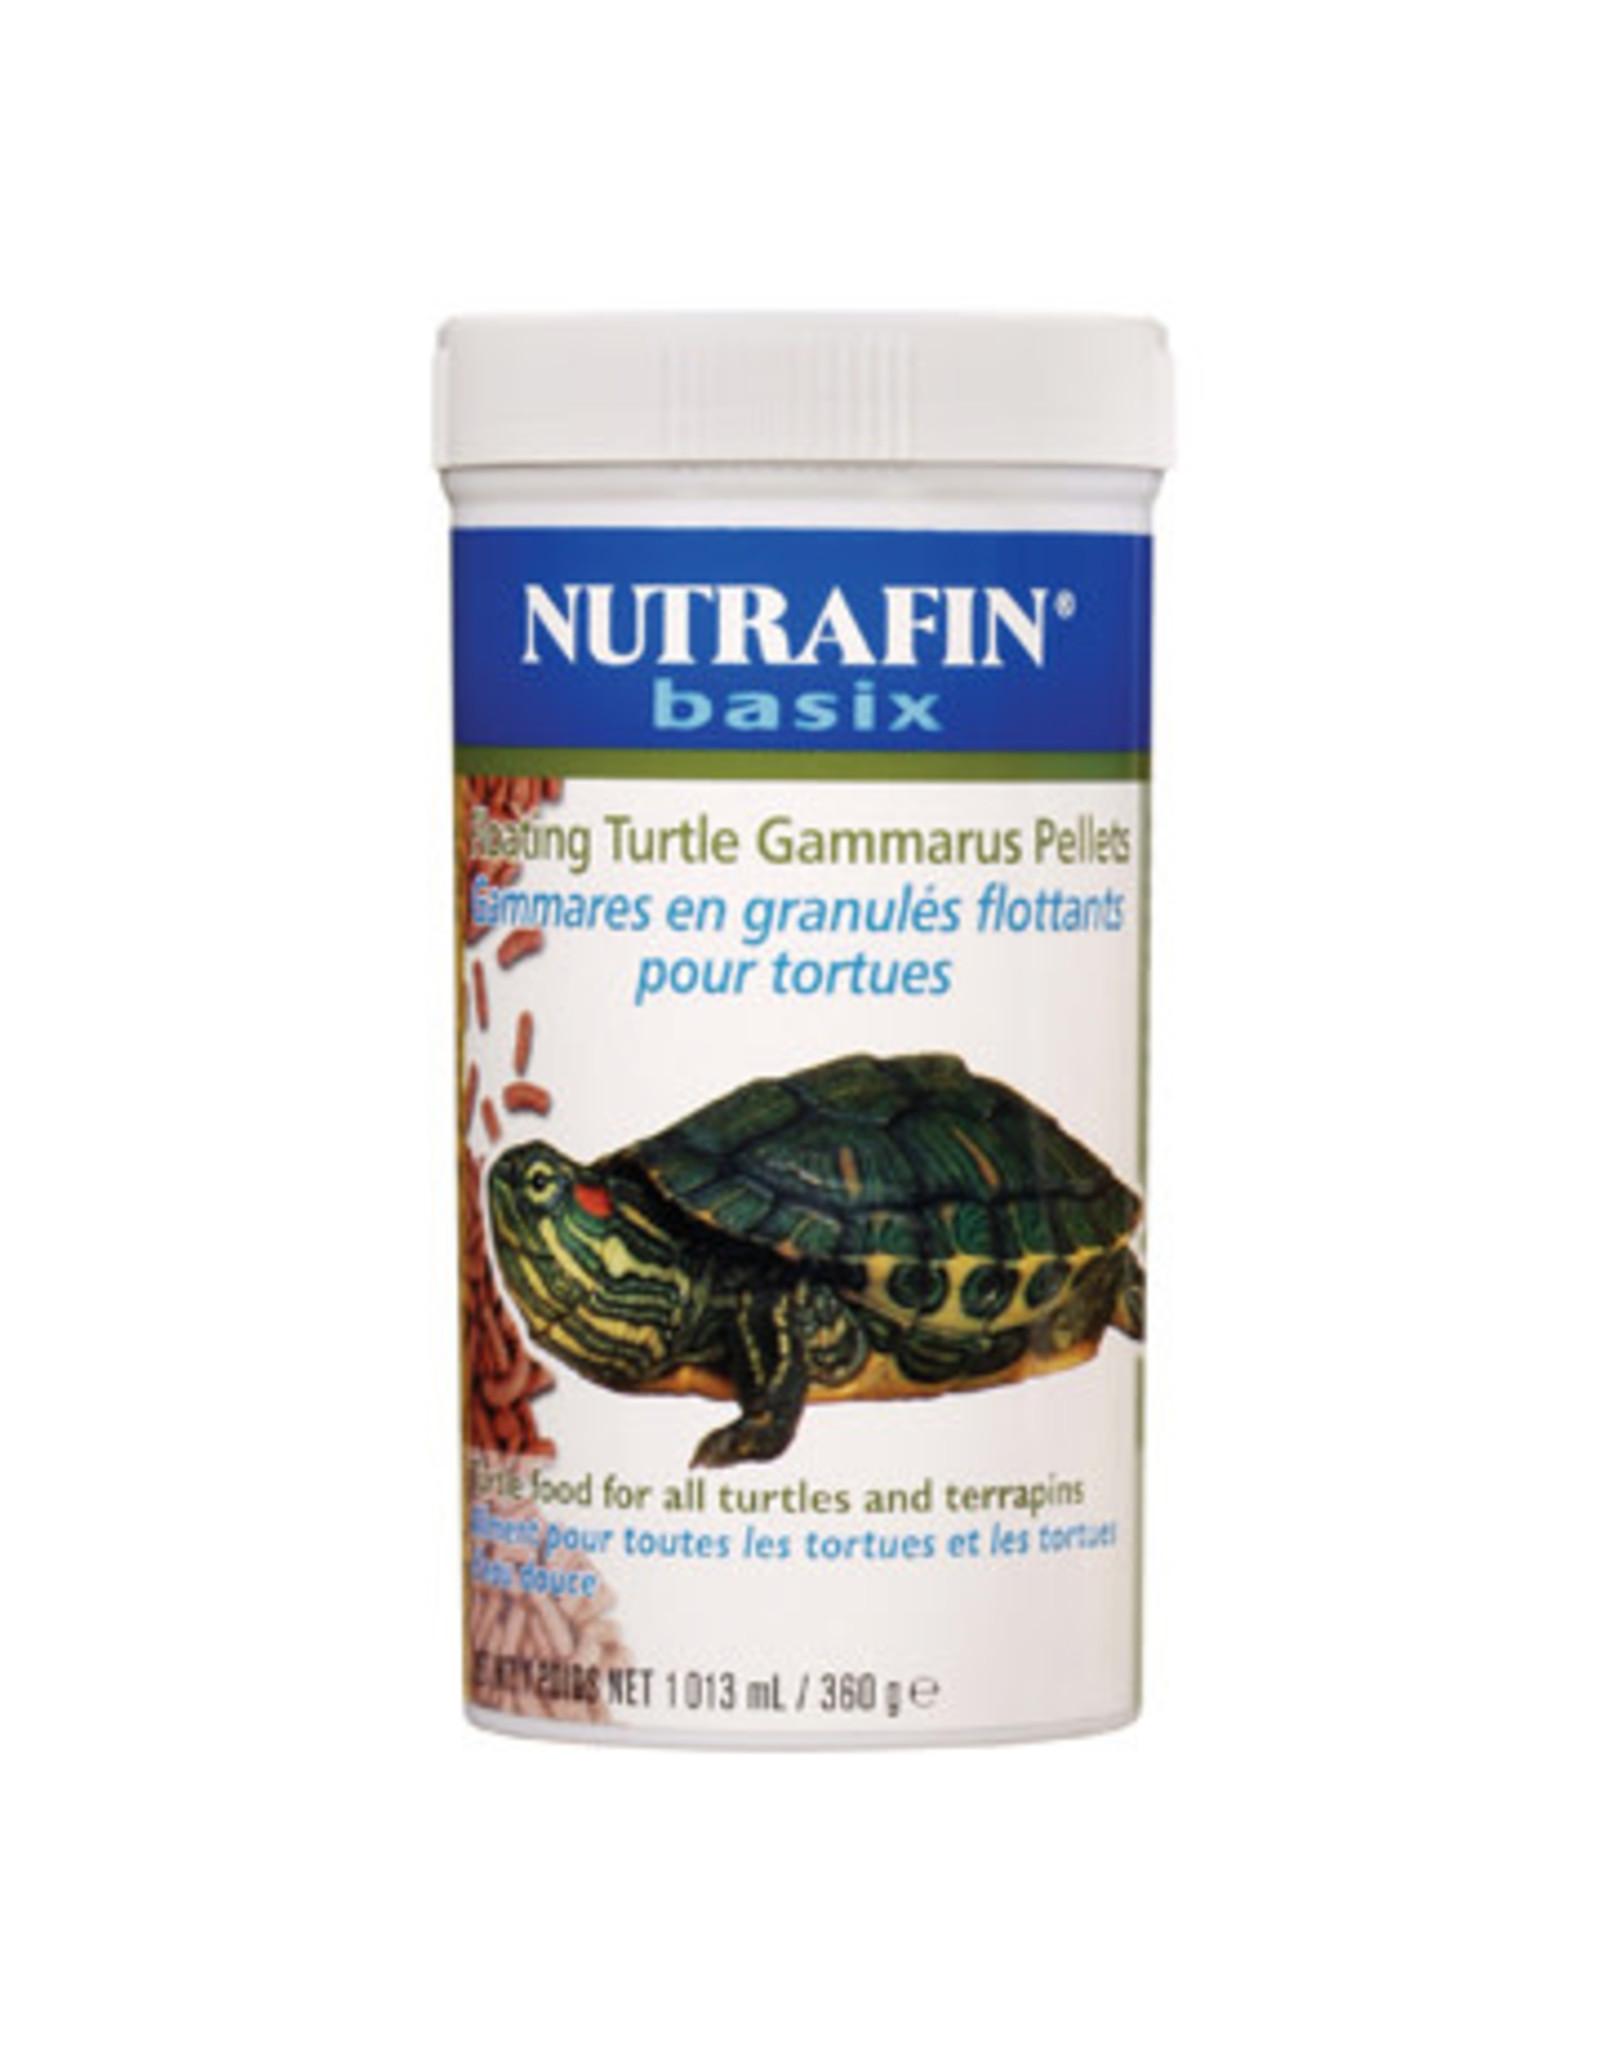 Nutrafin Nutrafin Basix Turtle Gammarus Pellet, 360g_12.6oz